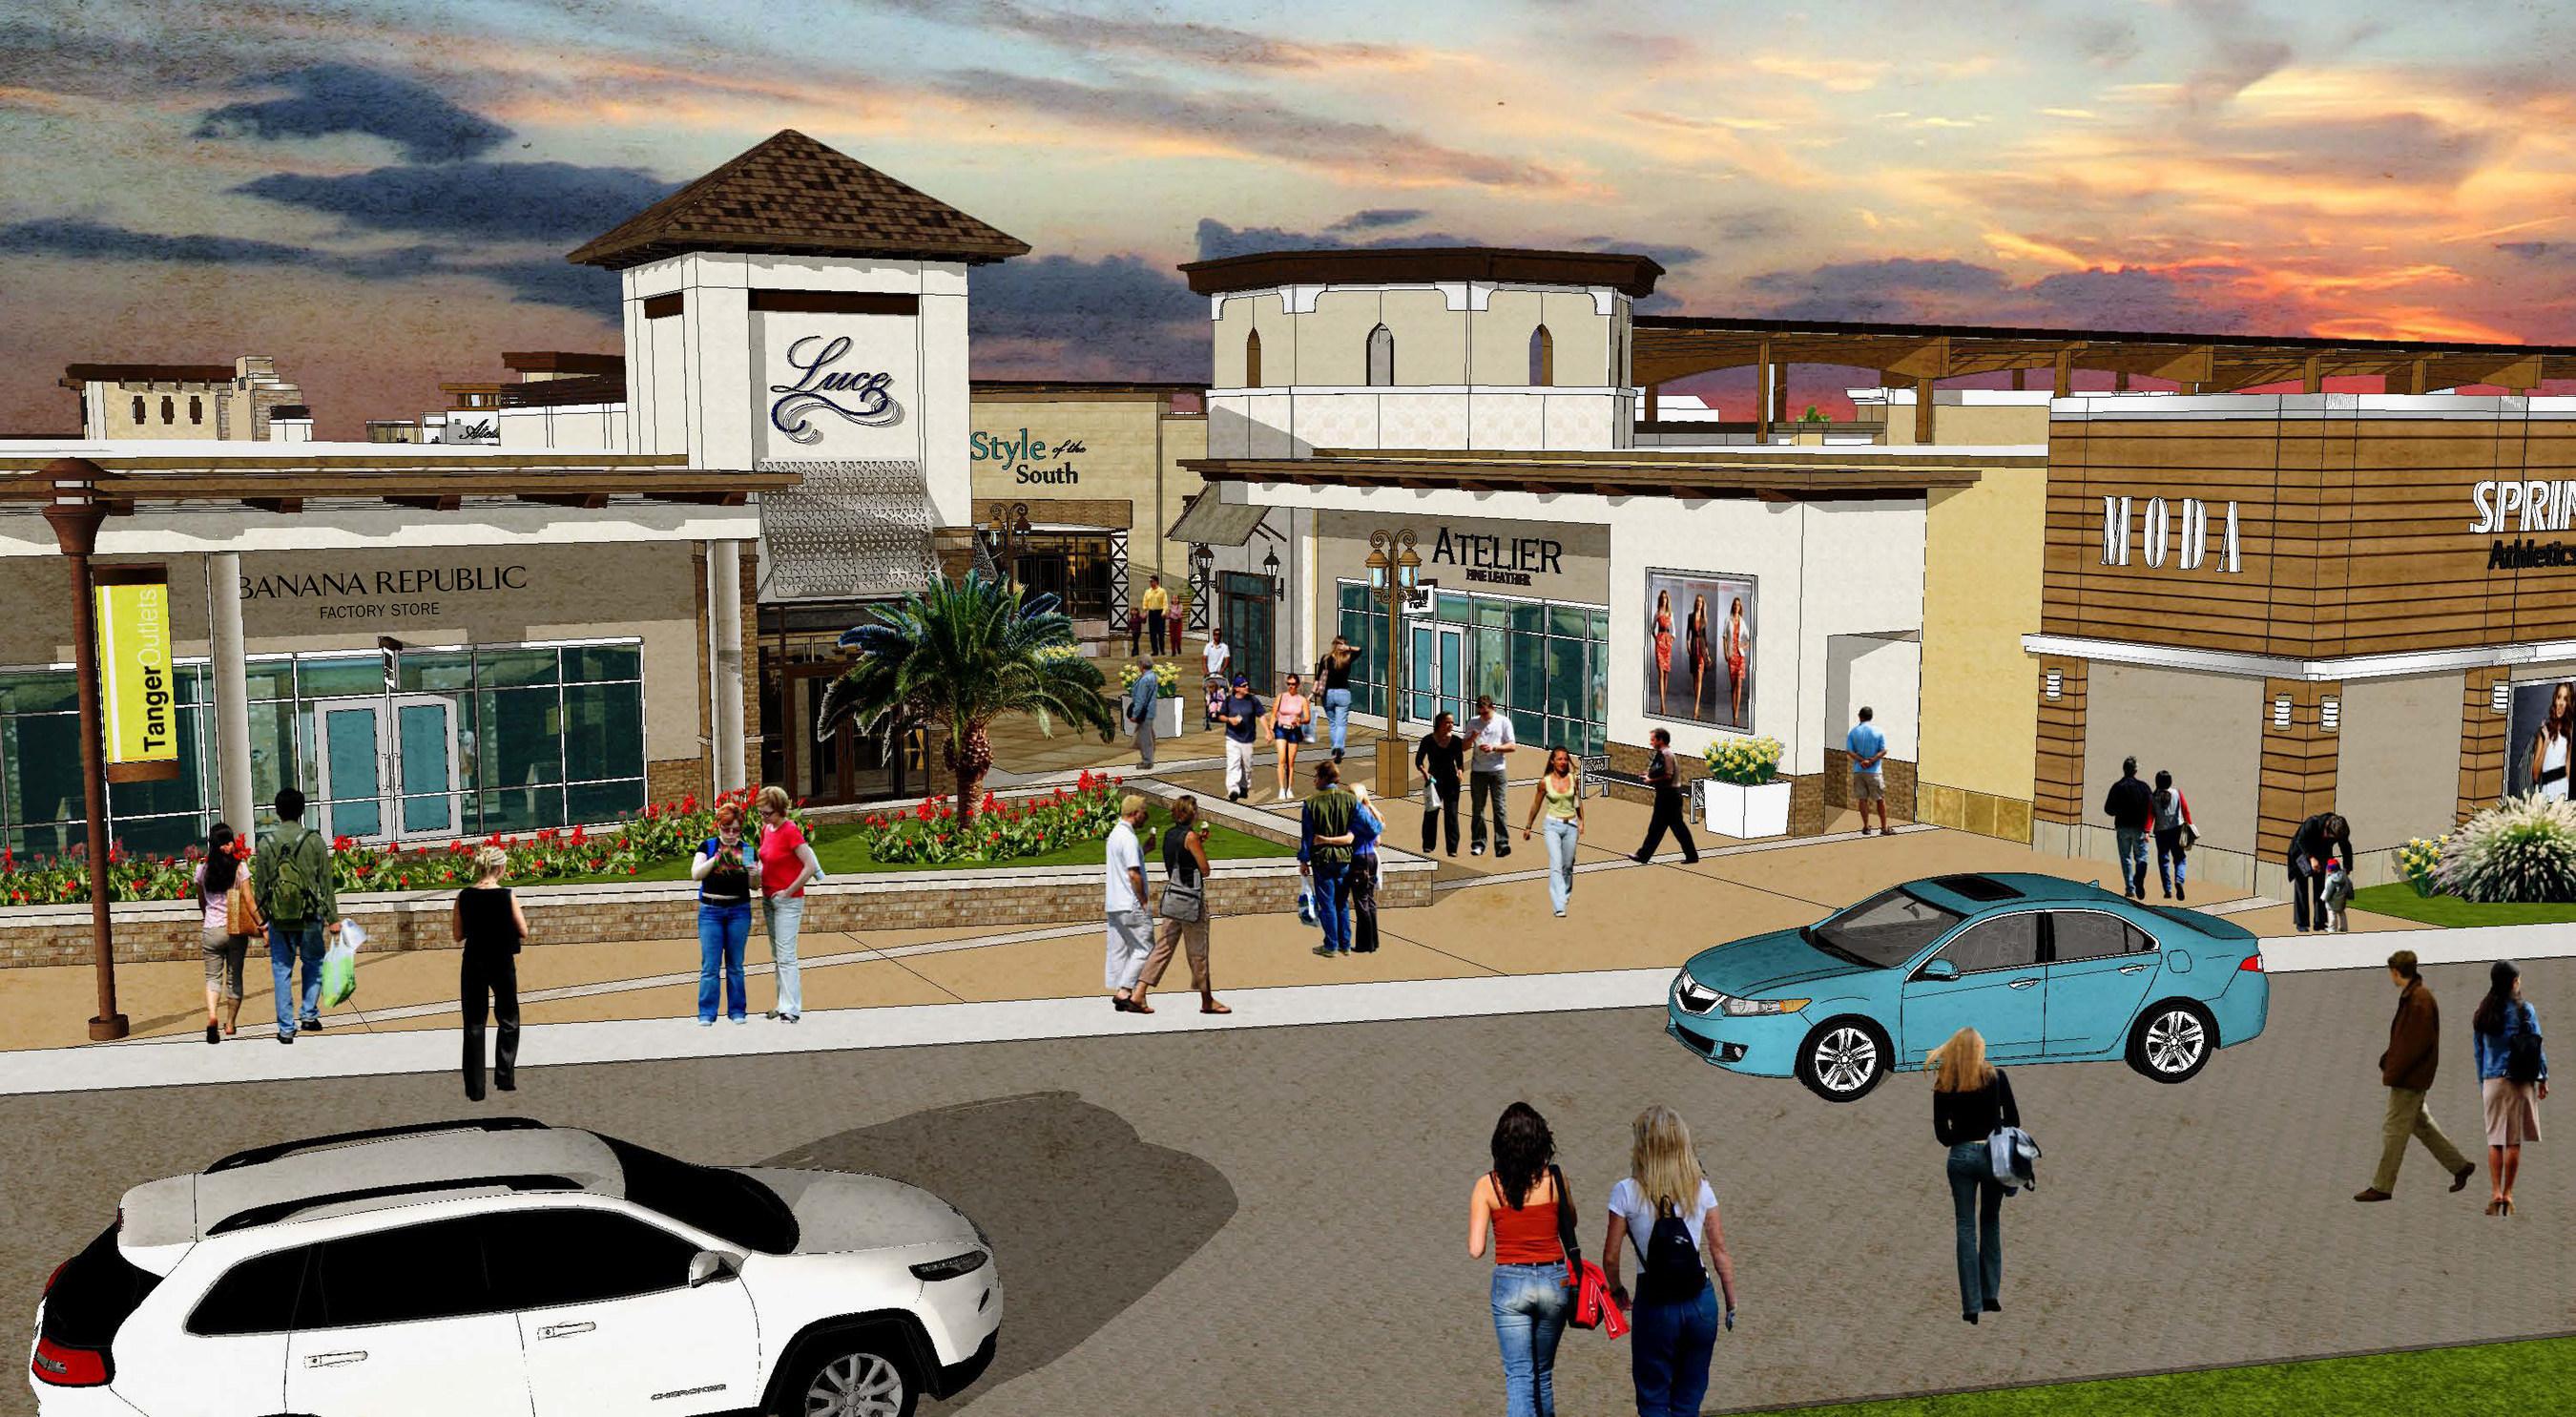 Betere Outlet Giant Revs up Progress on New Tanger Outlets Fort Worth HN-29